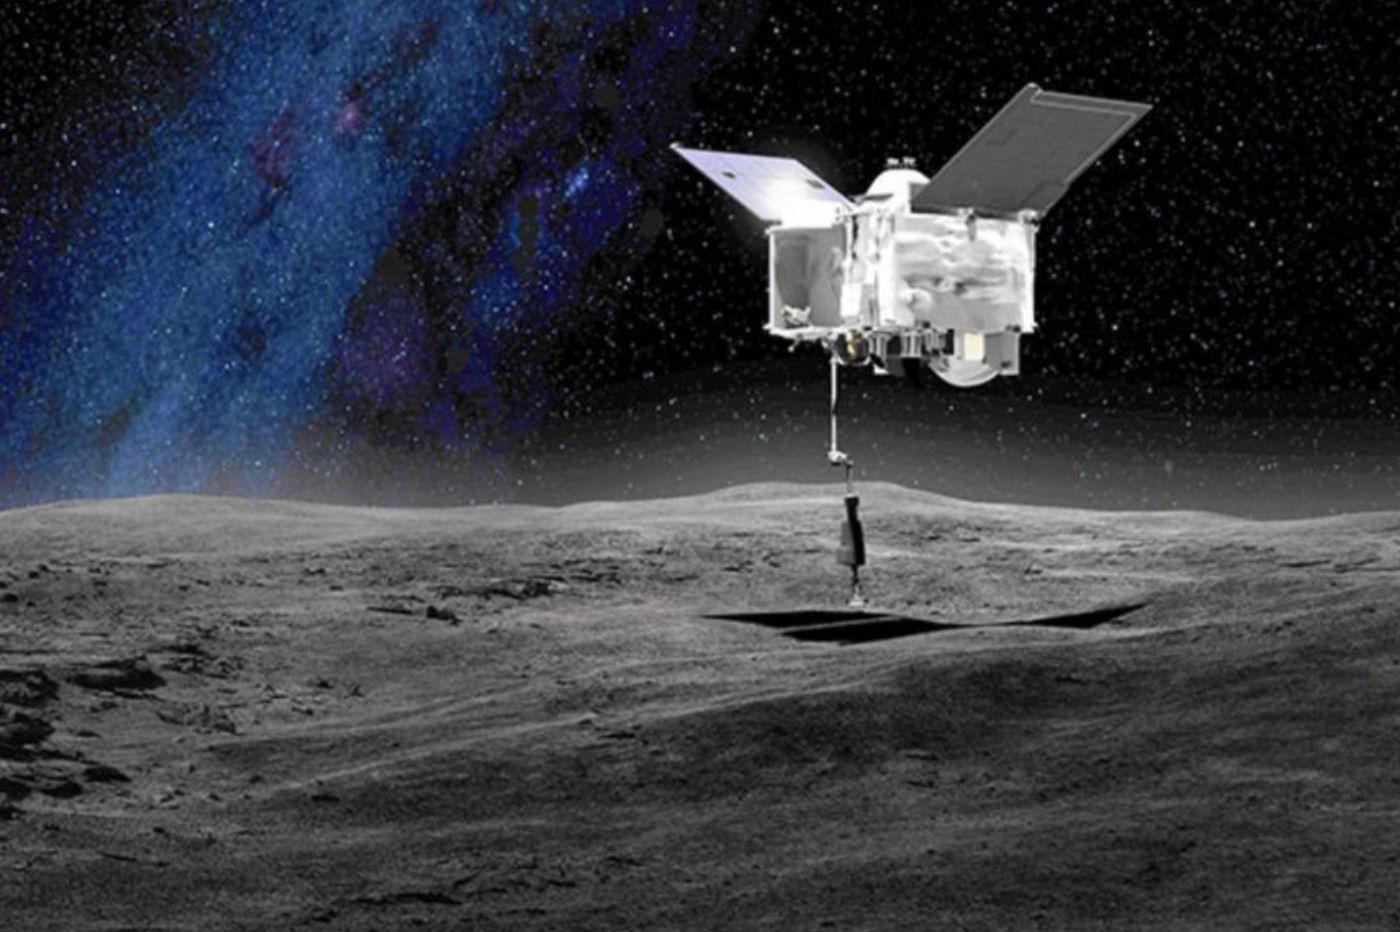 NASA : Mission sauvetage pour la sonde Osiris-Rex